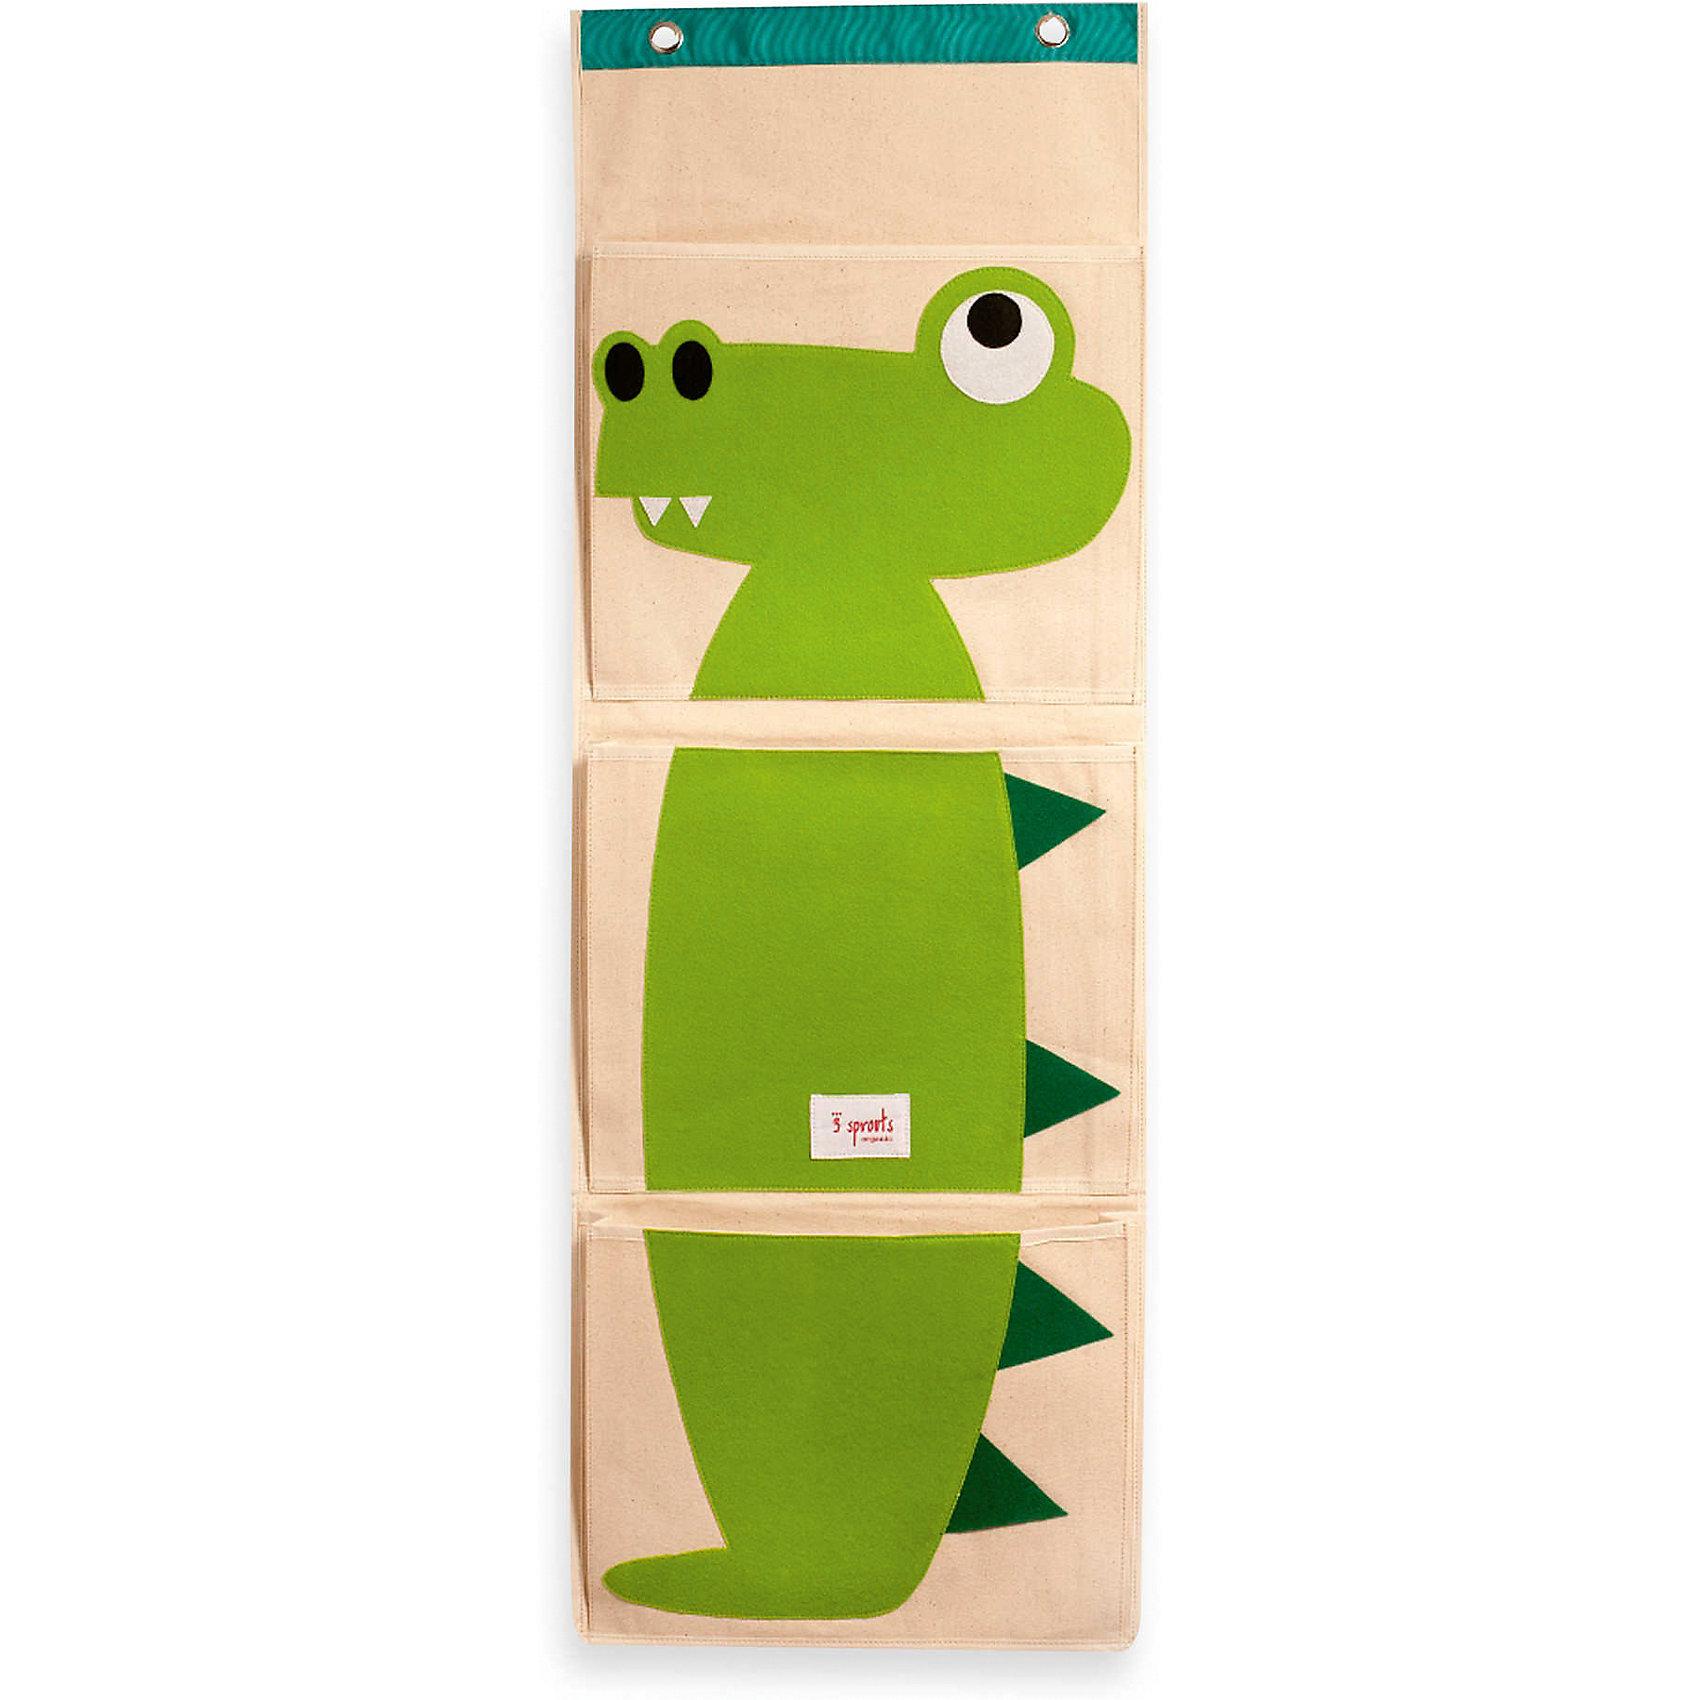 3 Sprouts Органайзер на стену Крокодил (Green Crocodile), 3 Sprouts 3 sprouts органайзер на спинку сидения автомобиля